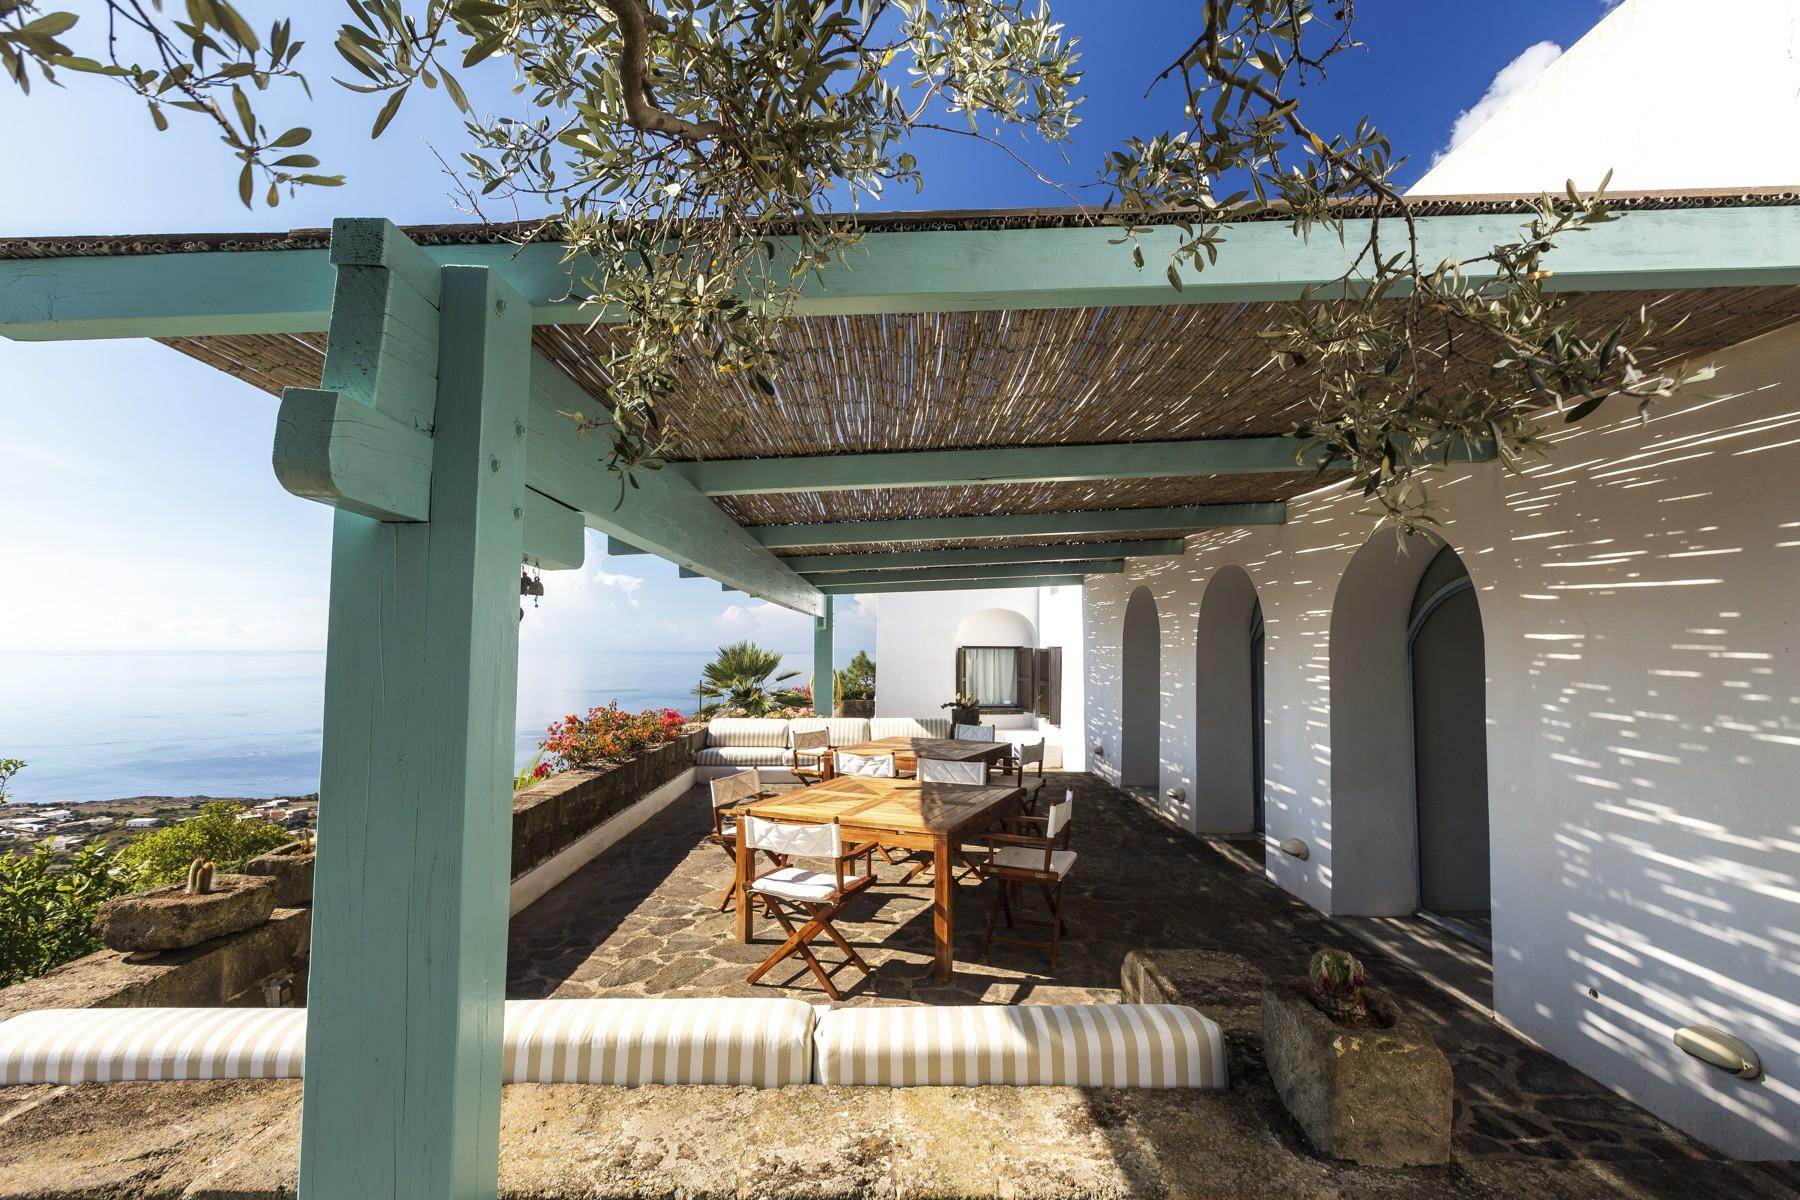 Villa in Vendita a Pantelleria: 5 locali, 530 mq - Foto 4